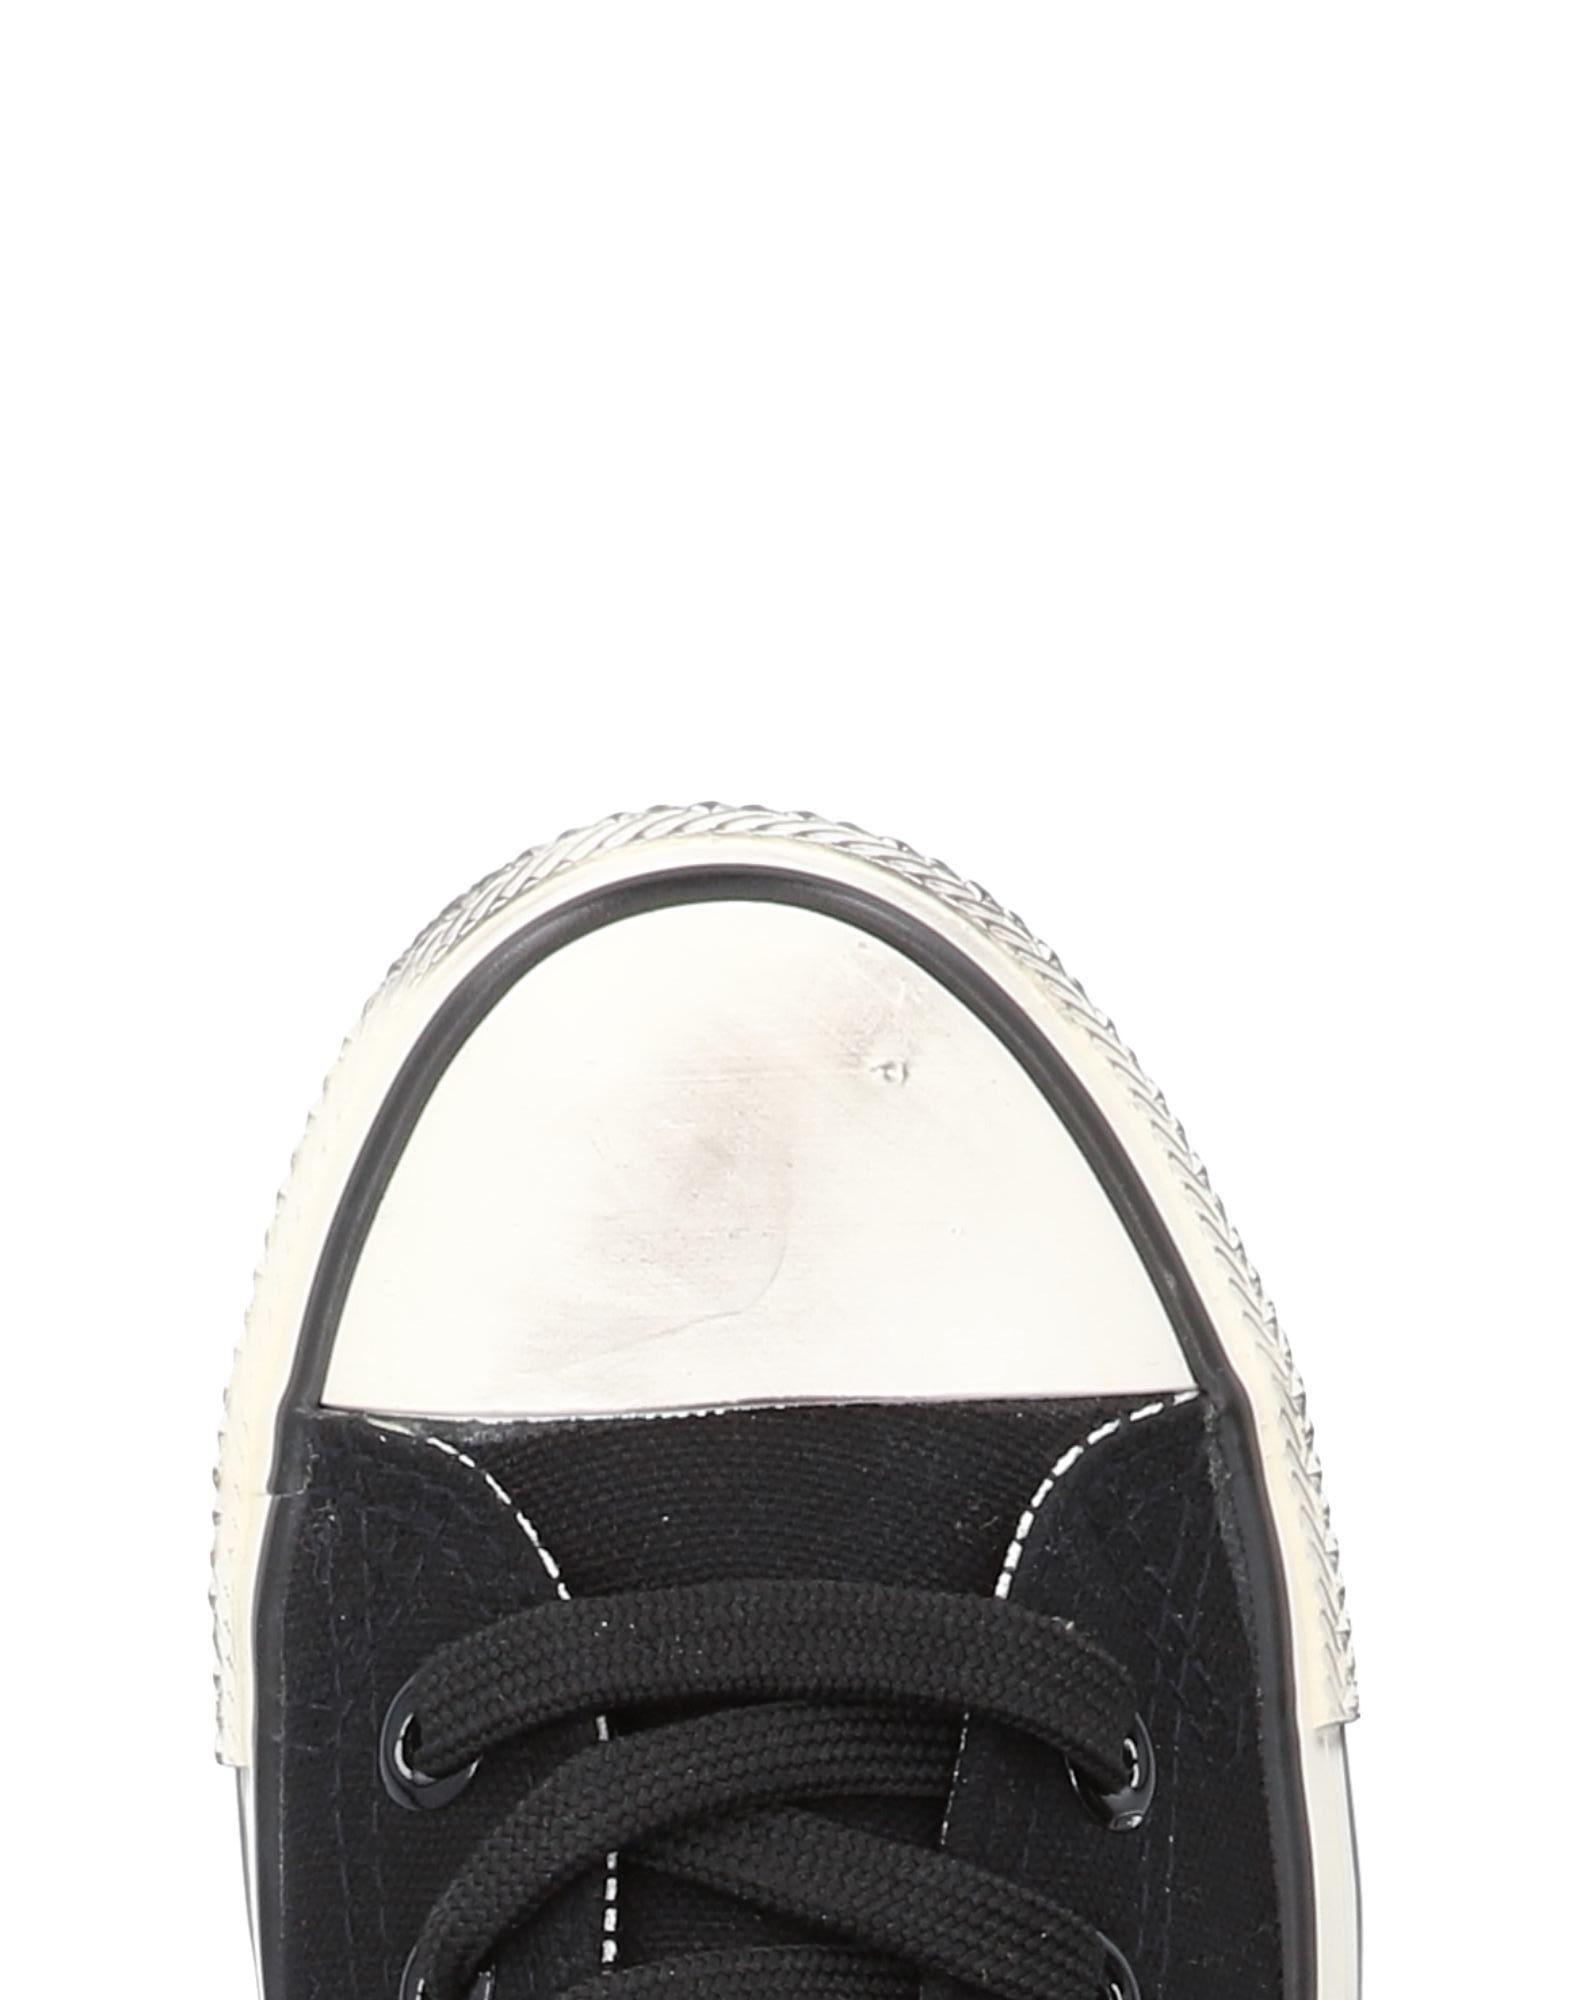 Moda Sneakers 2Star Donna Donna 2Star - 11496382HM 7b6842